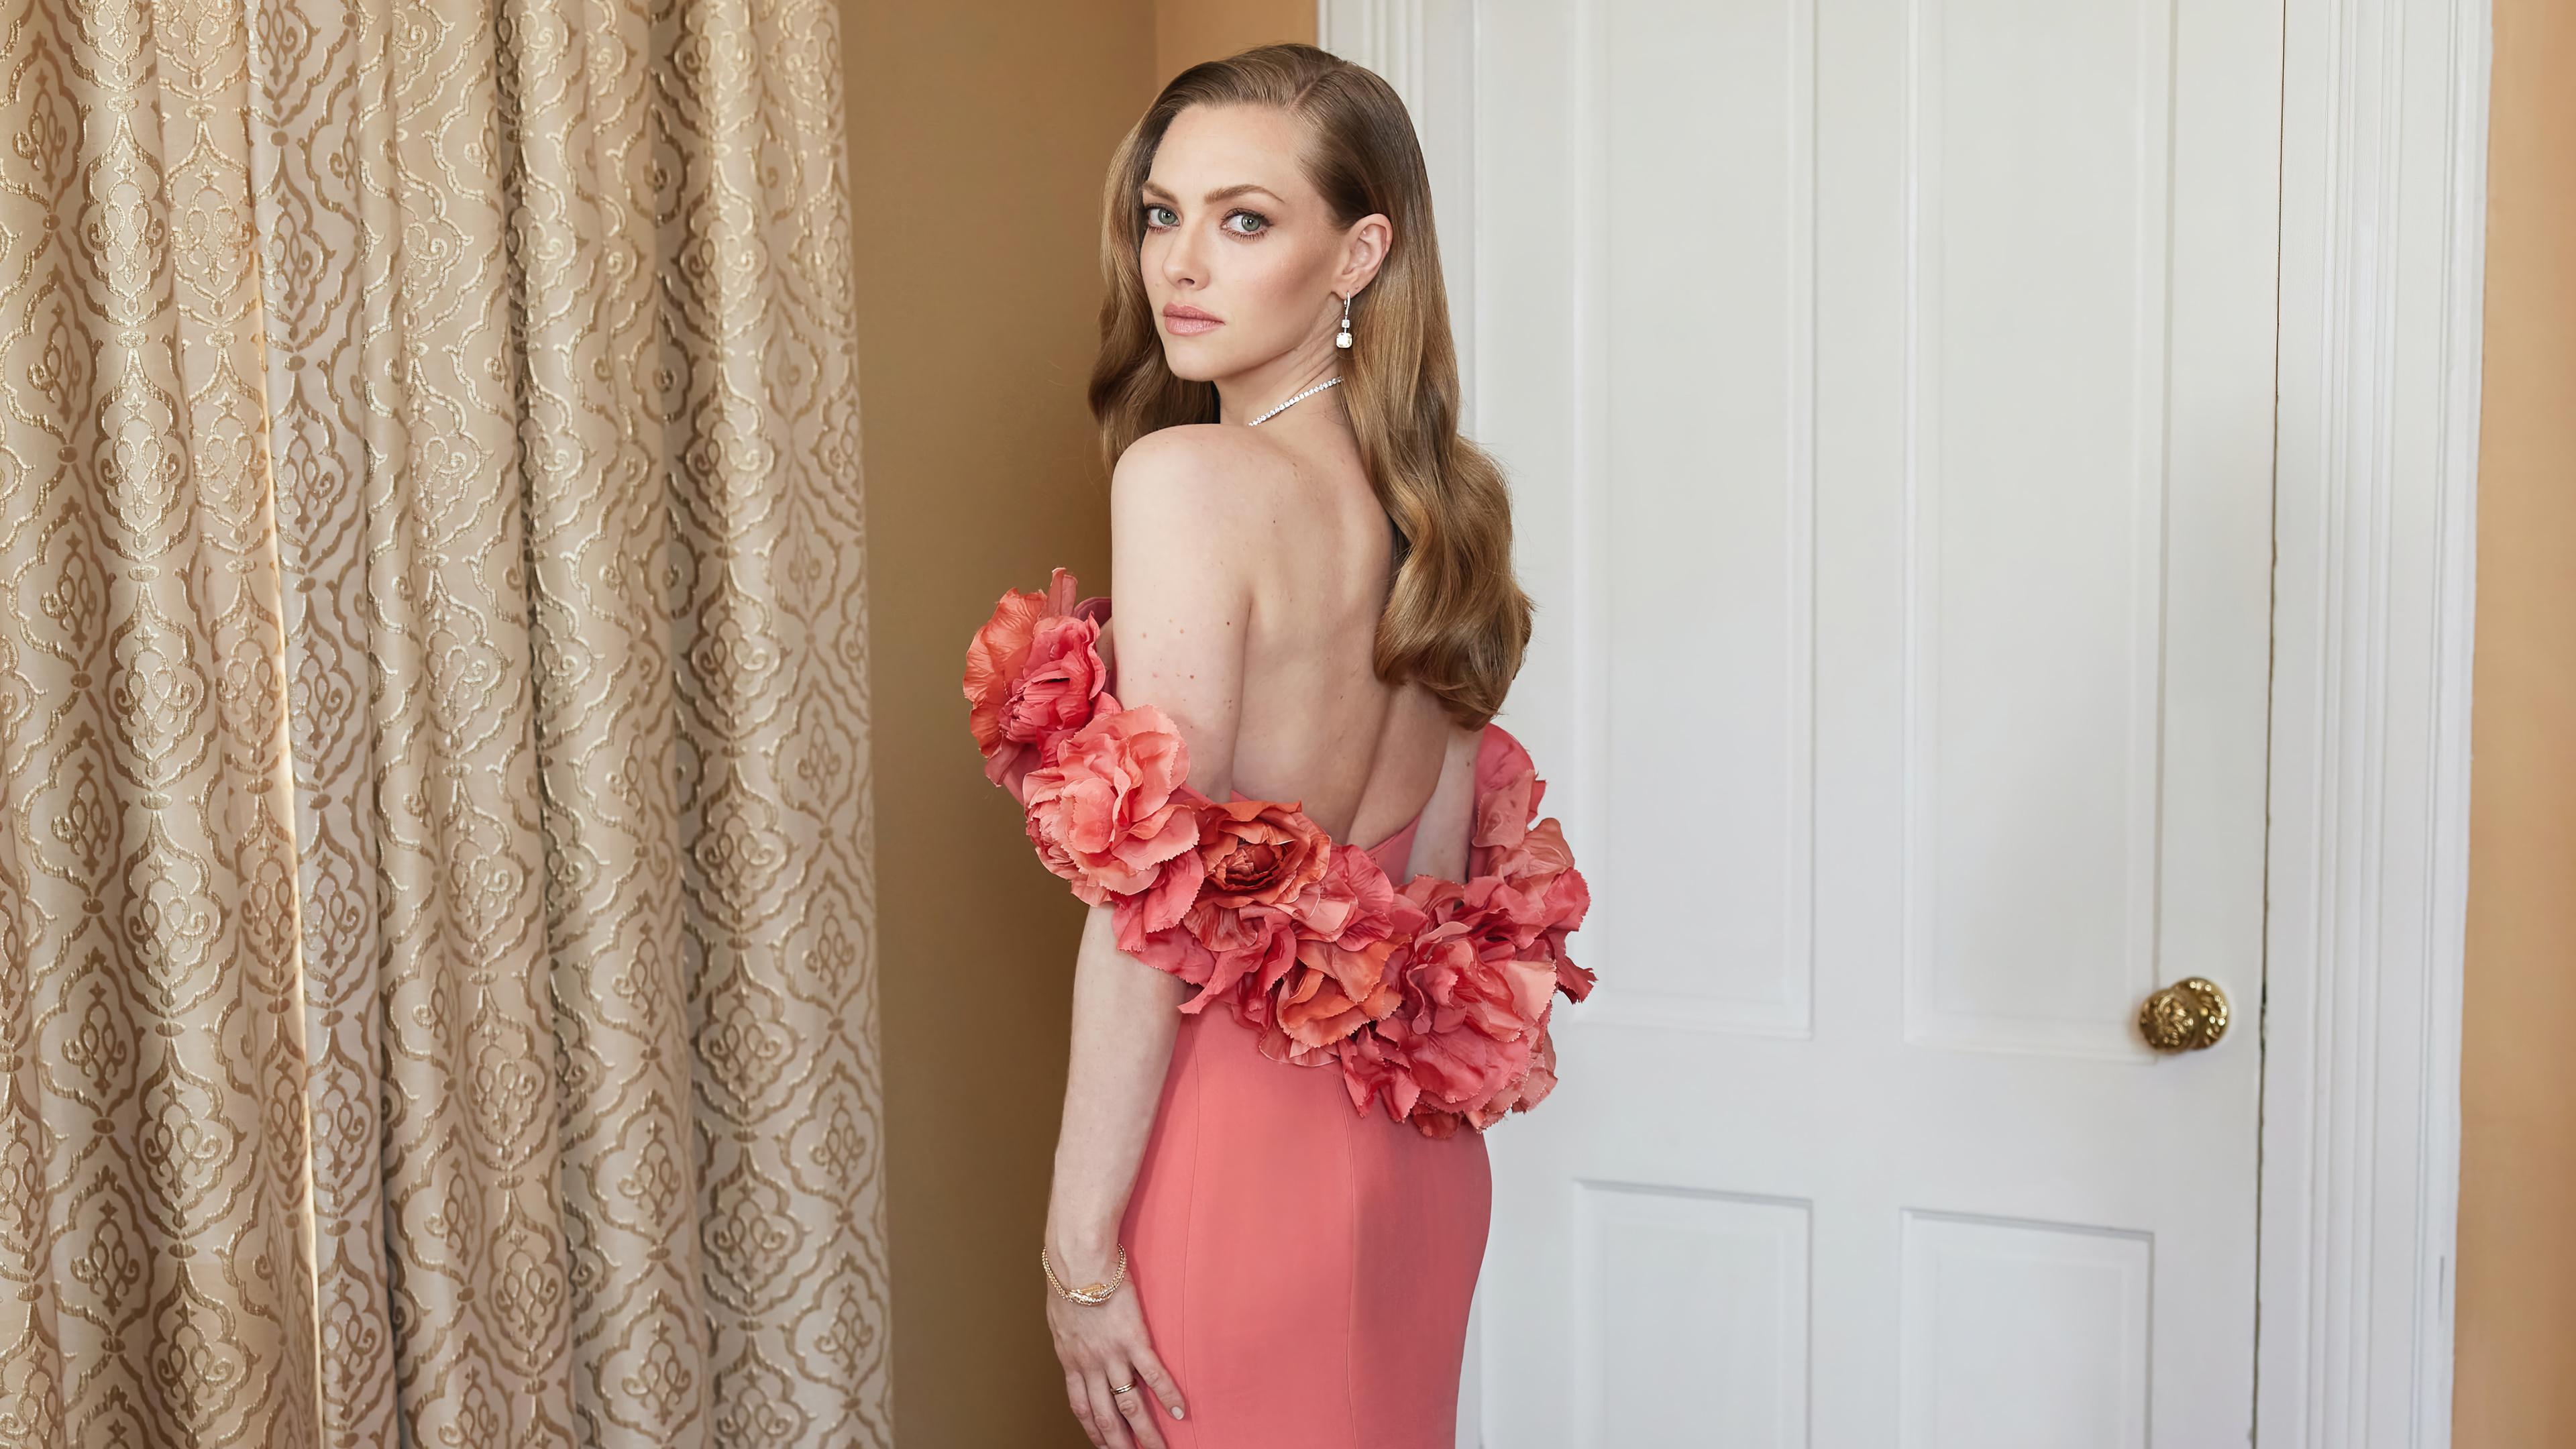 Fondos de pantalla Amanda Seyfried vestido rosa